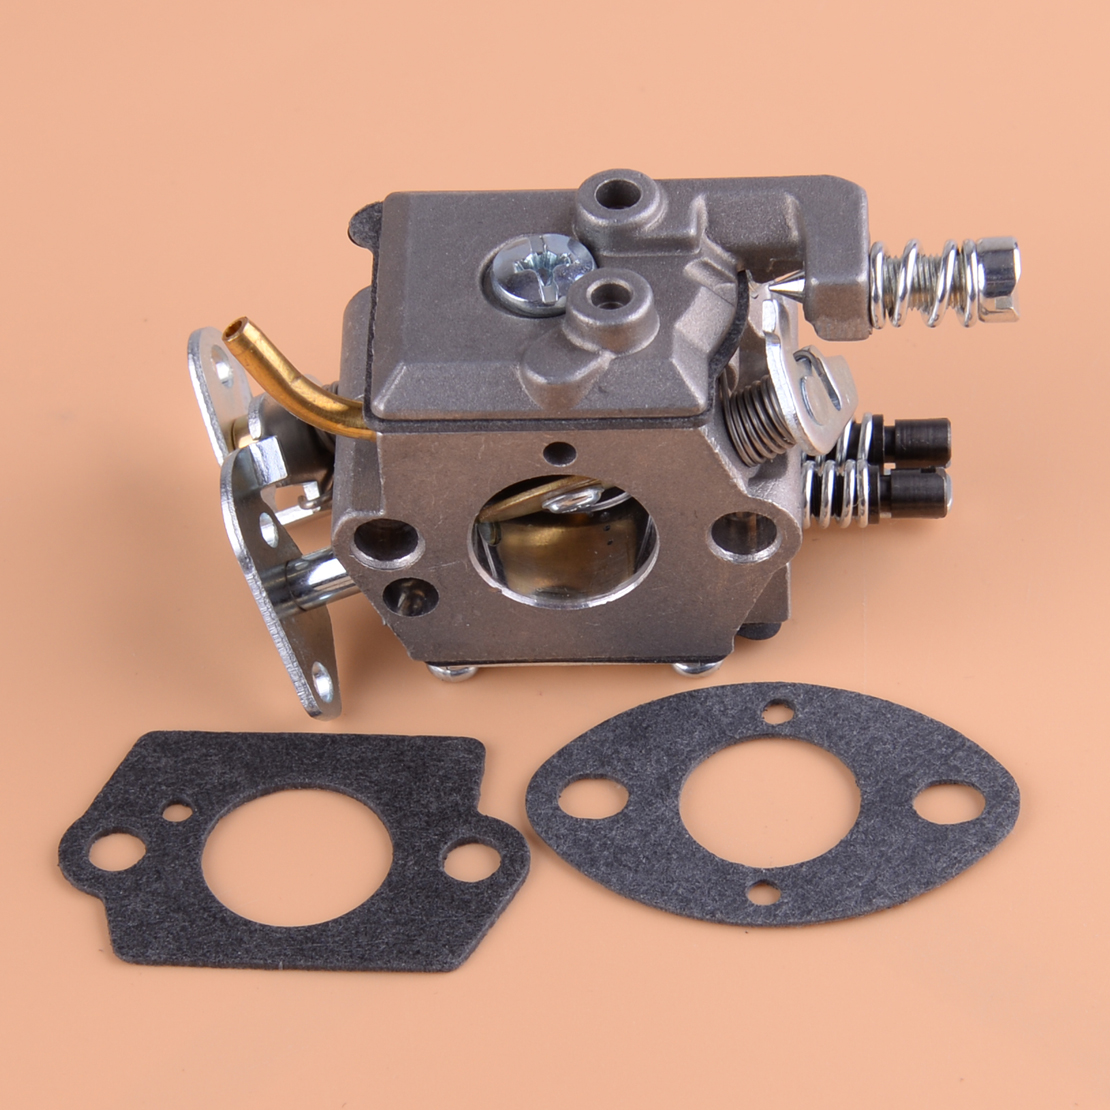 LETAOSK Carburetor Carb Kit 530071987 530019172 530035482 Fit For Husqvarna 36 41 136 137 137e 141 142 Chainsaw Zama C1Q-W29E